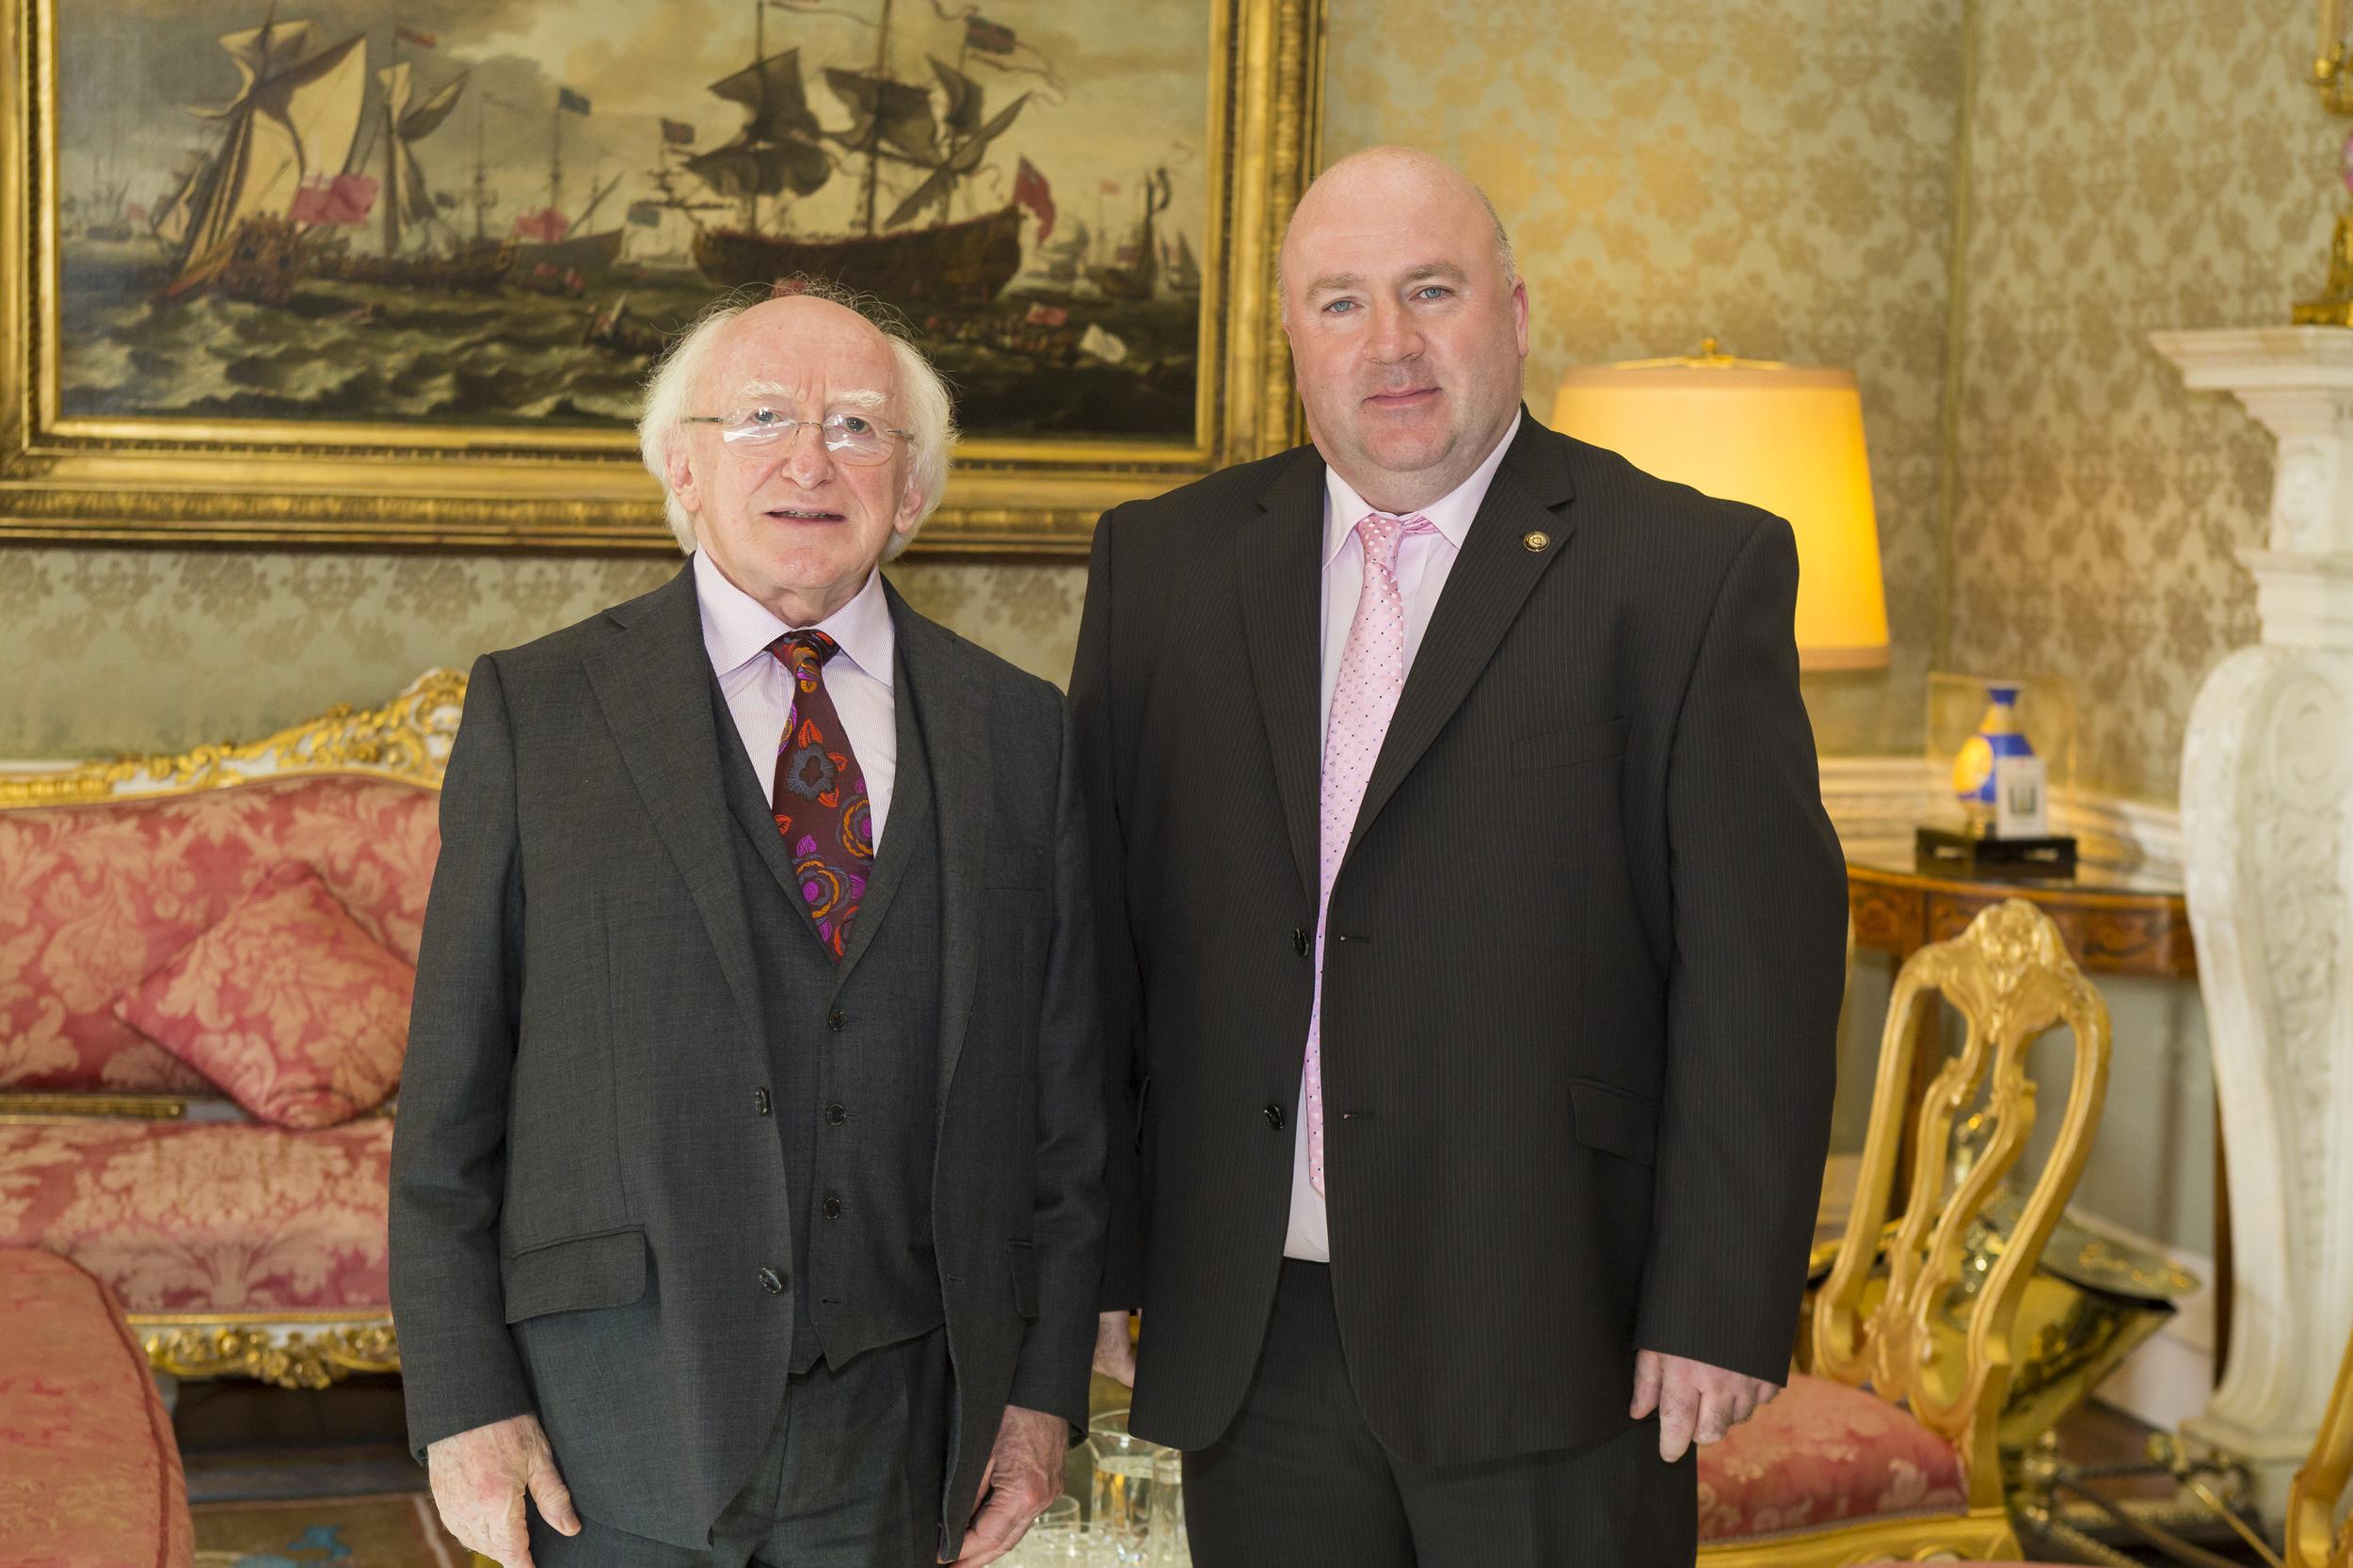 Dermot O'Donnell and President Michael D. Higgins